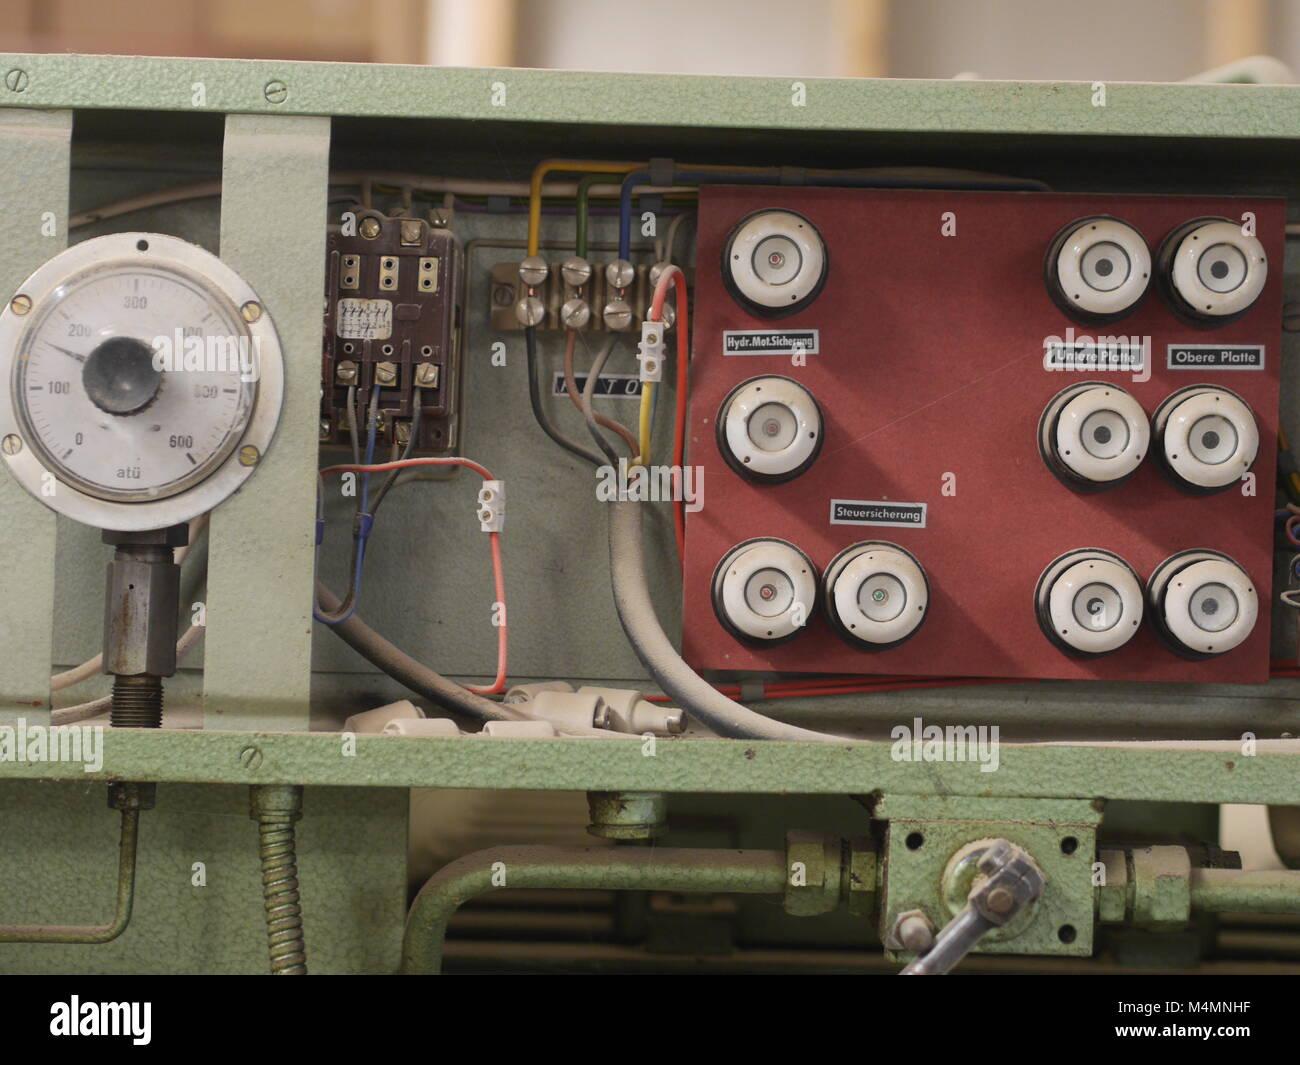 wiring fuse stockfotos wiring fuse bilder alamy. Black Bedroom Furniture Sets. Home Design Ideas